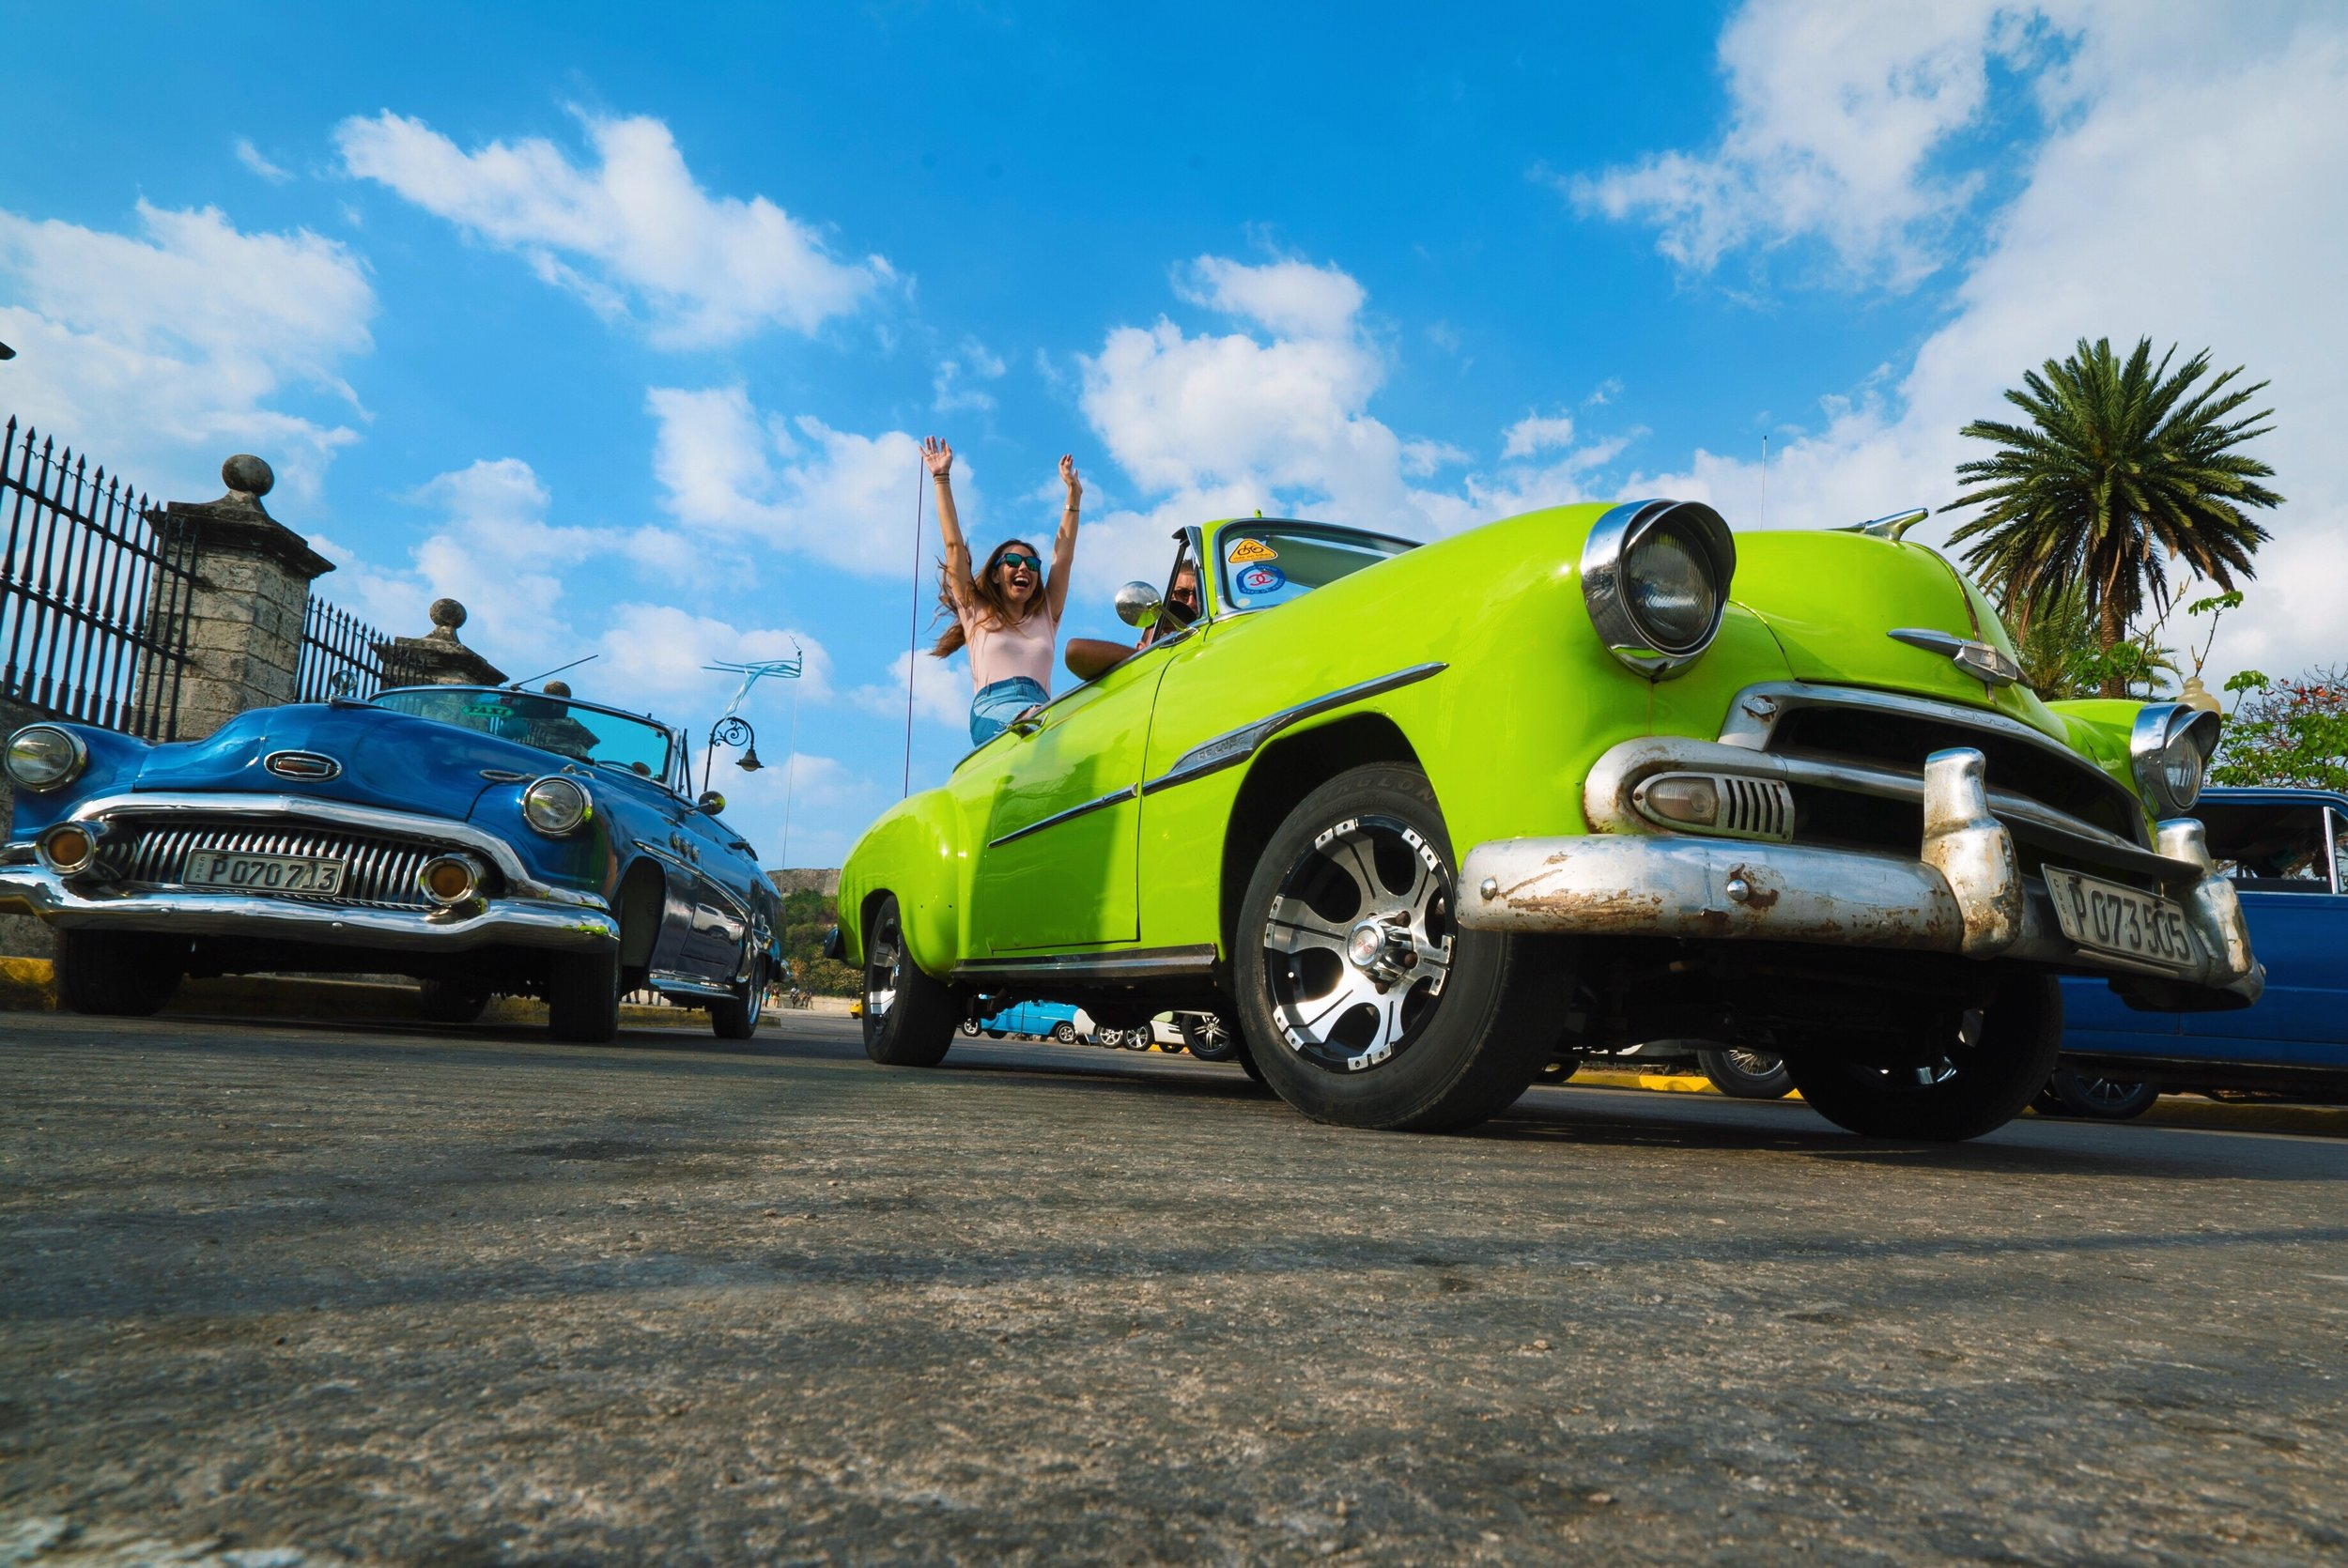 lime green car havana cuba